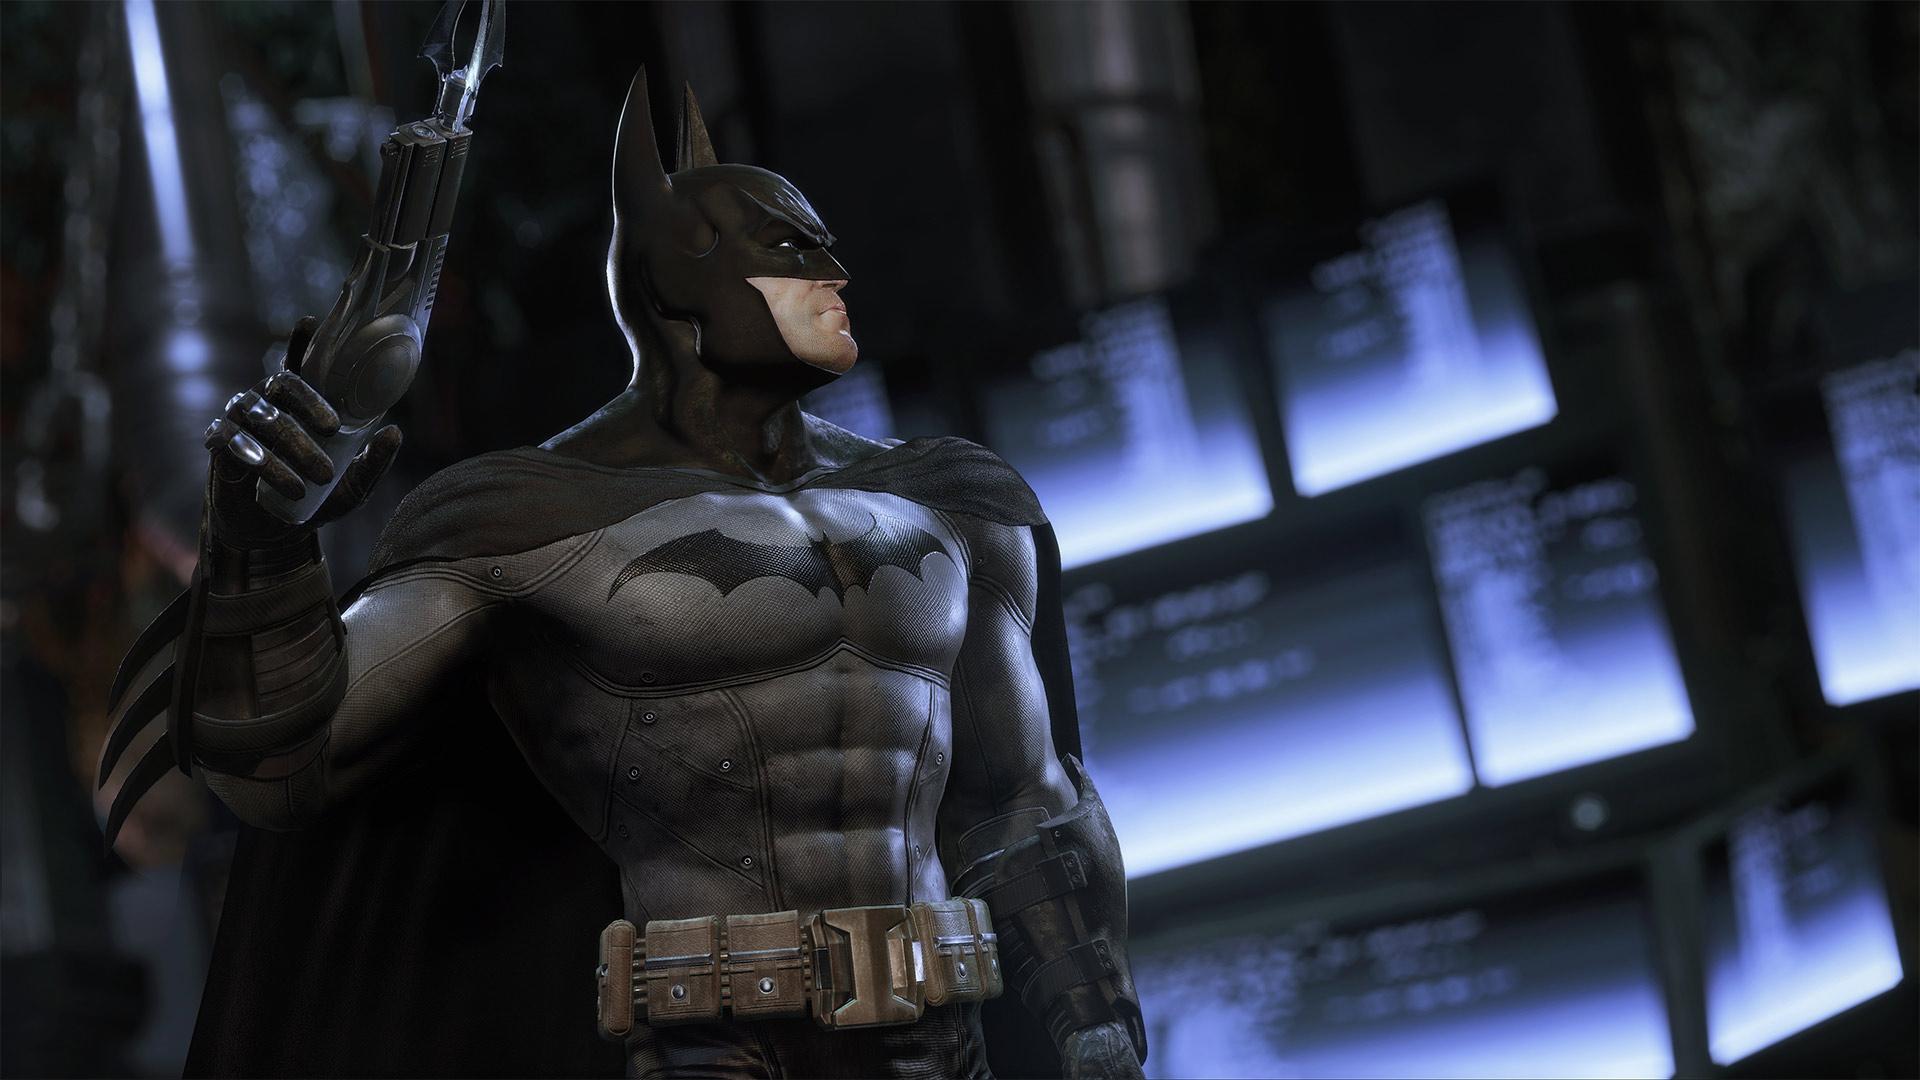 Batman Return To Arkham On PS4